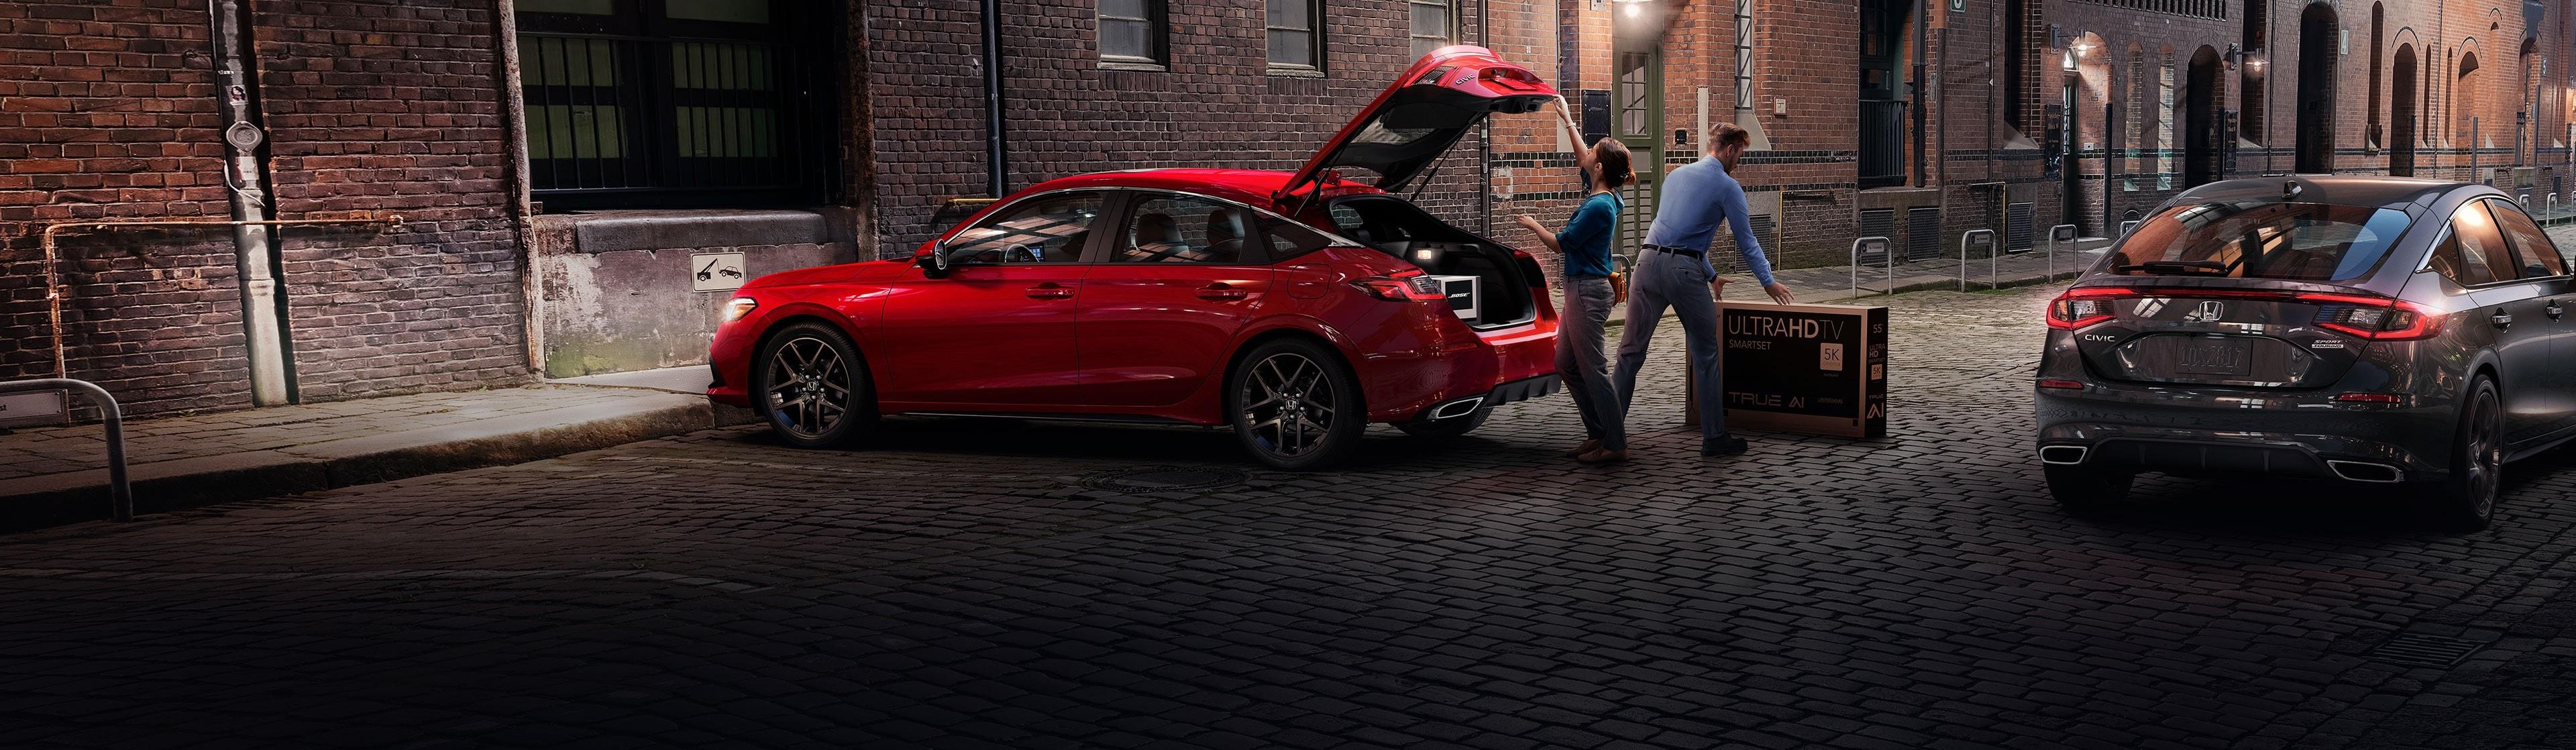 All-New 2022 Honda Civic for Sale in Joplin, MO